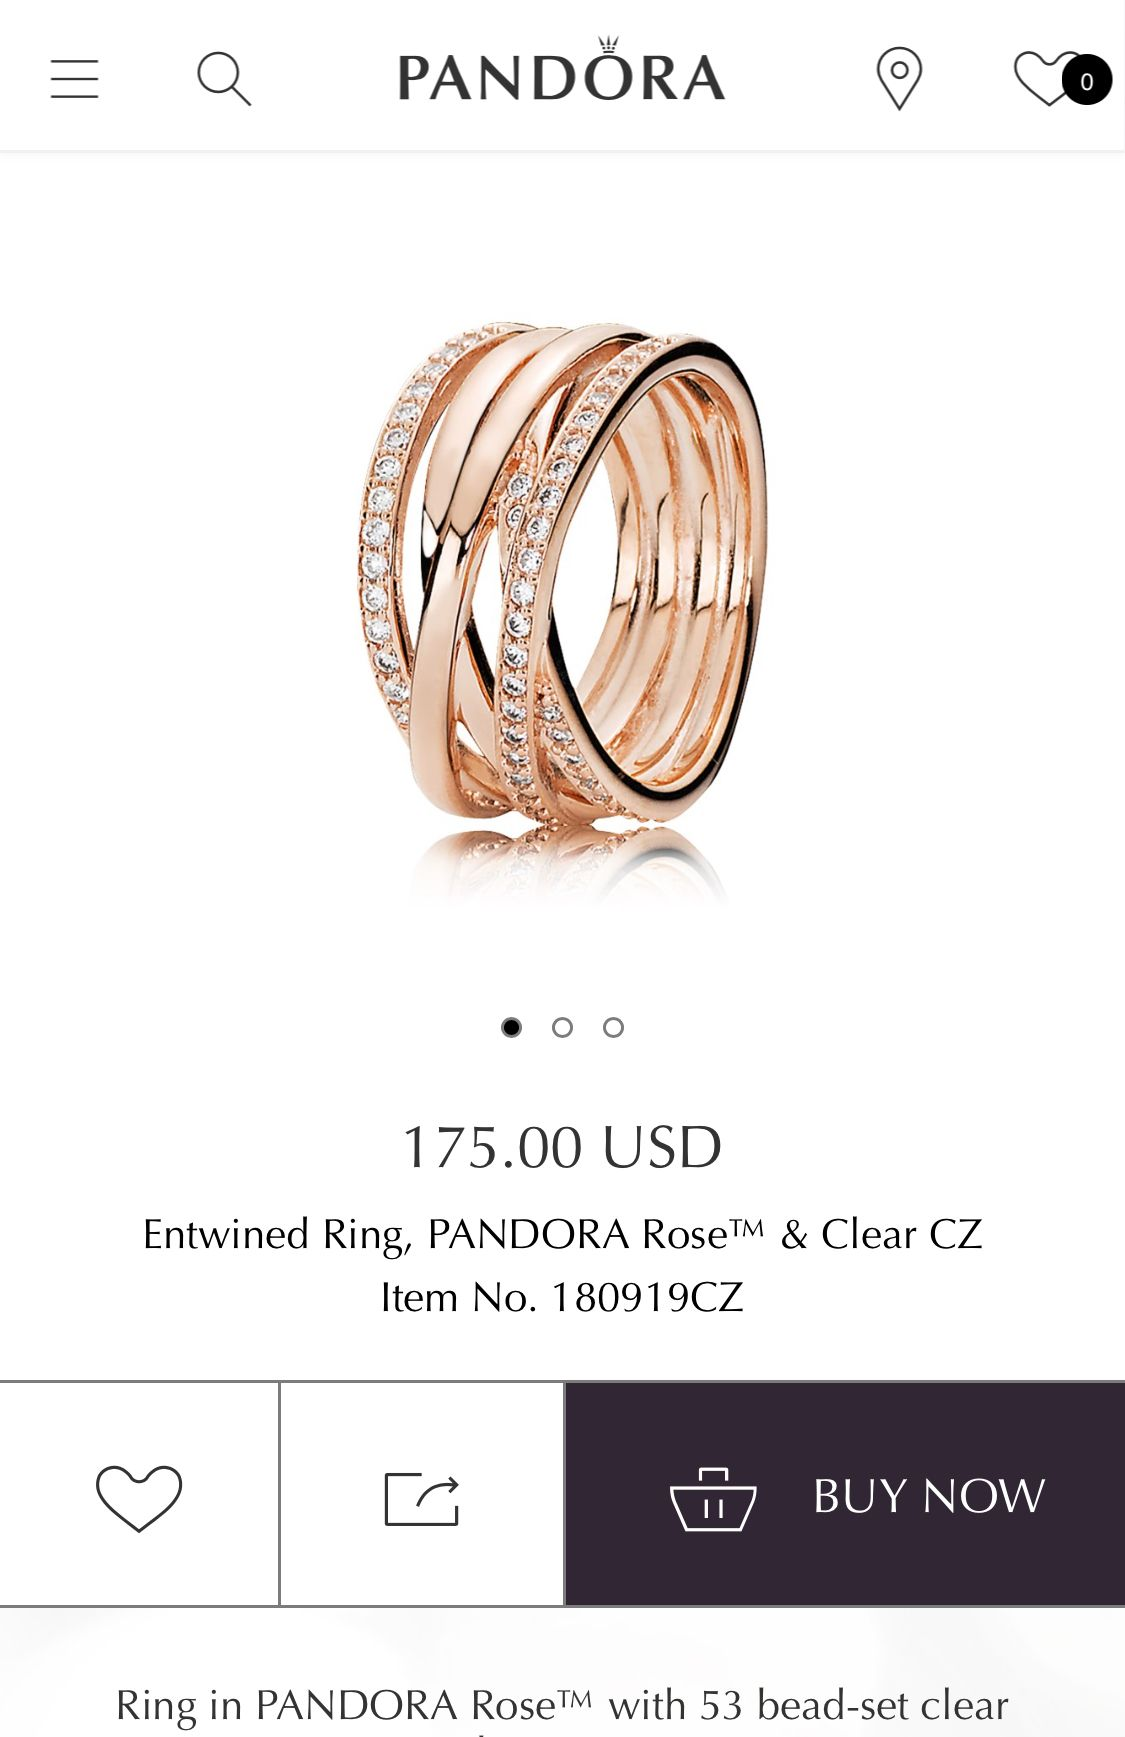 b89d5882b Pin de Felicity Riggin en My Style! | Pandora entwined ring, Gold ...